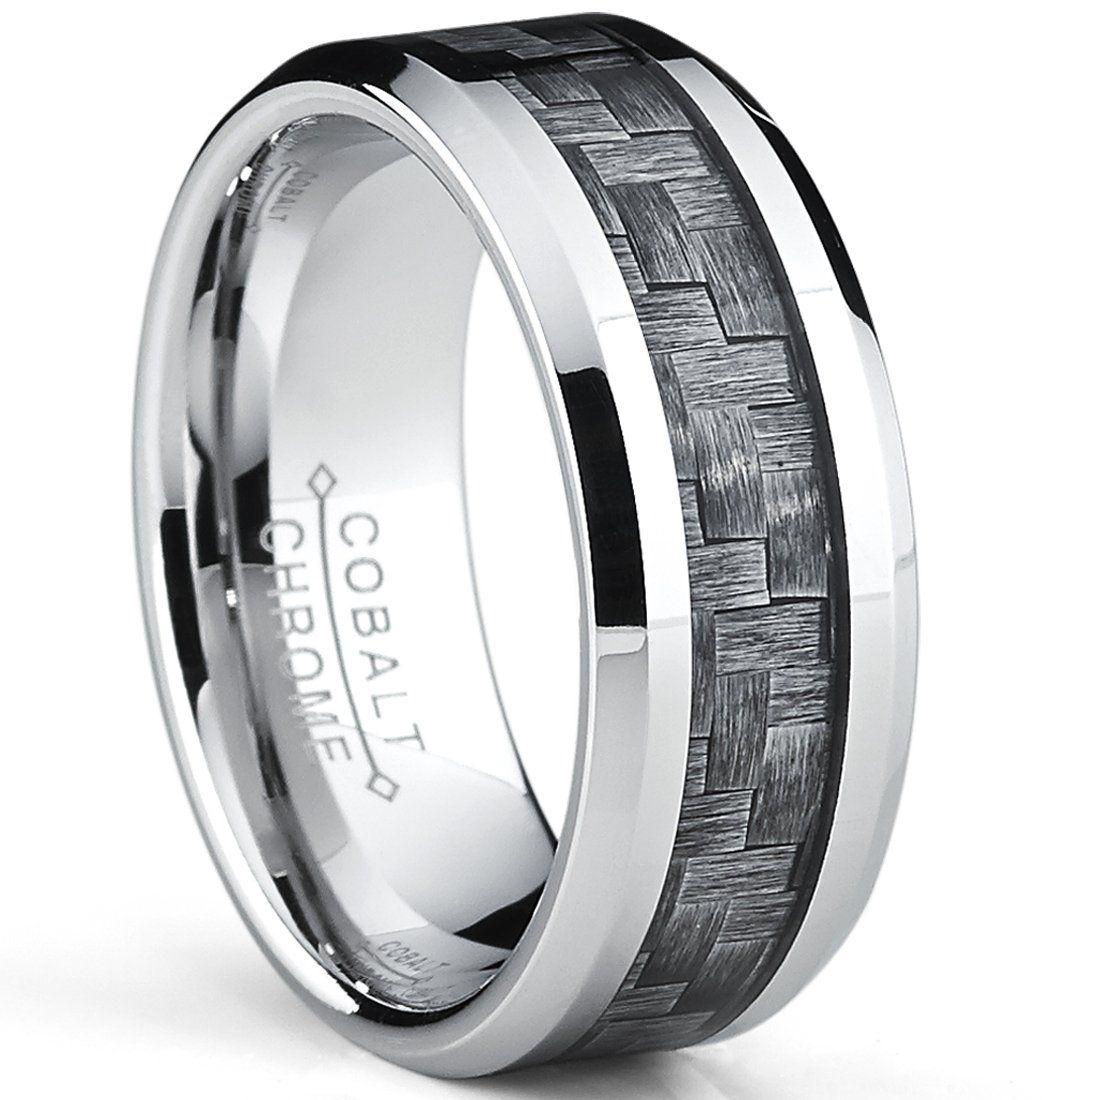 High Polish Cobalt Men's Wedding Band Engagement Ring W/ Gray Carbon Fiber Inlay, Comfort Fit SZ 7